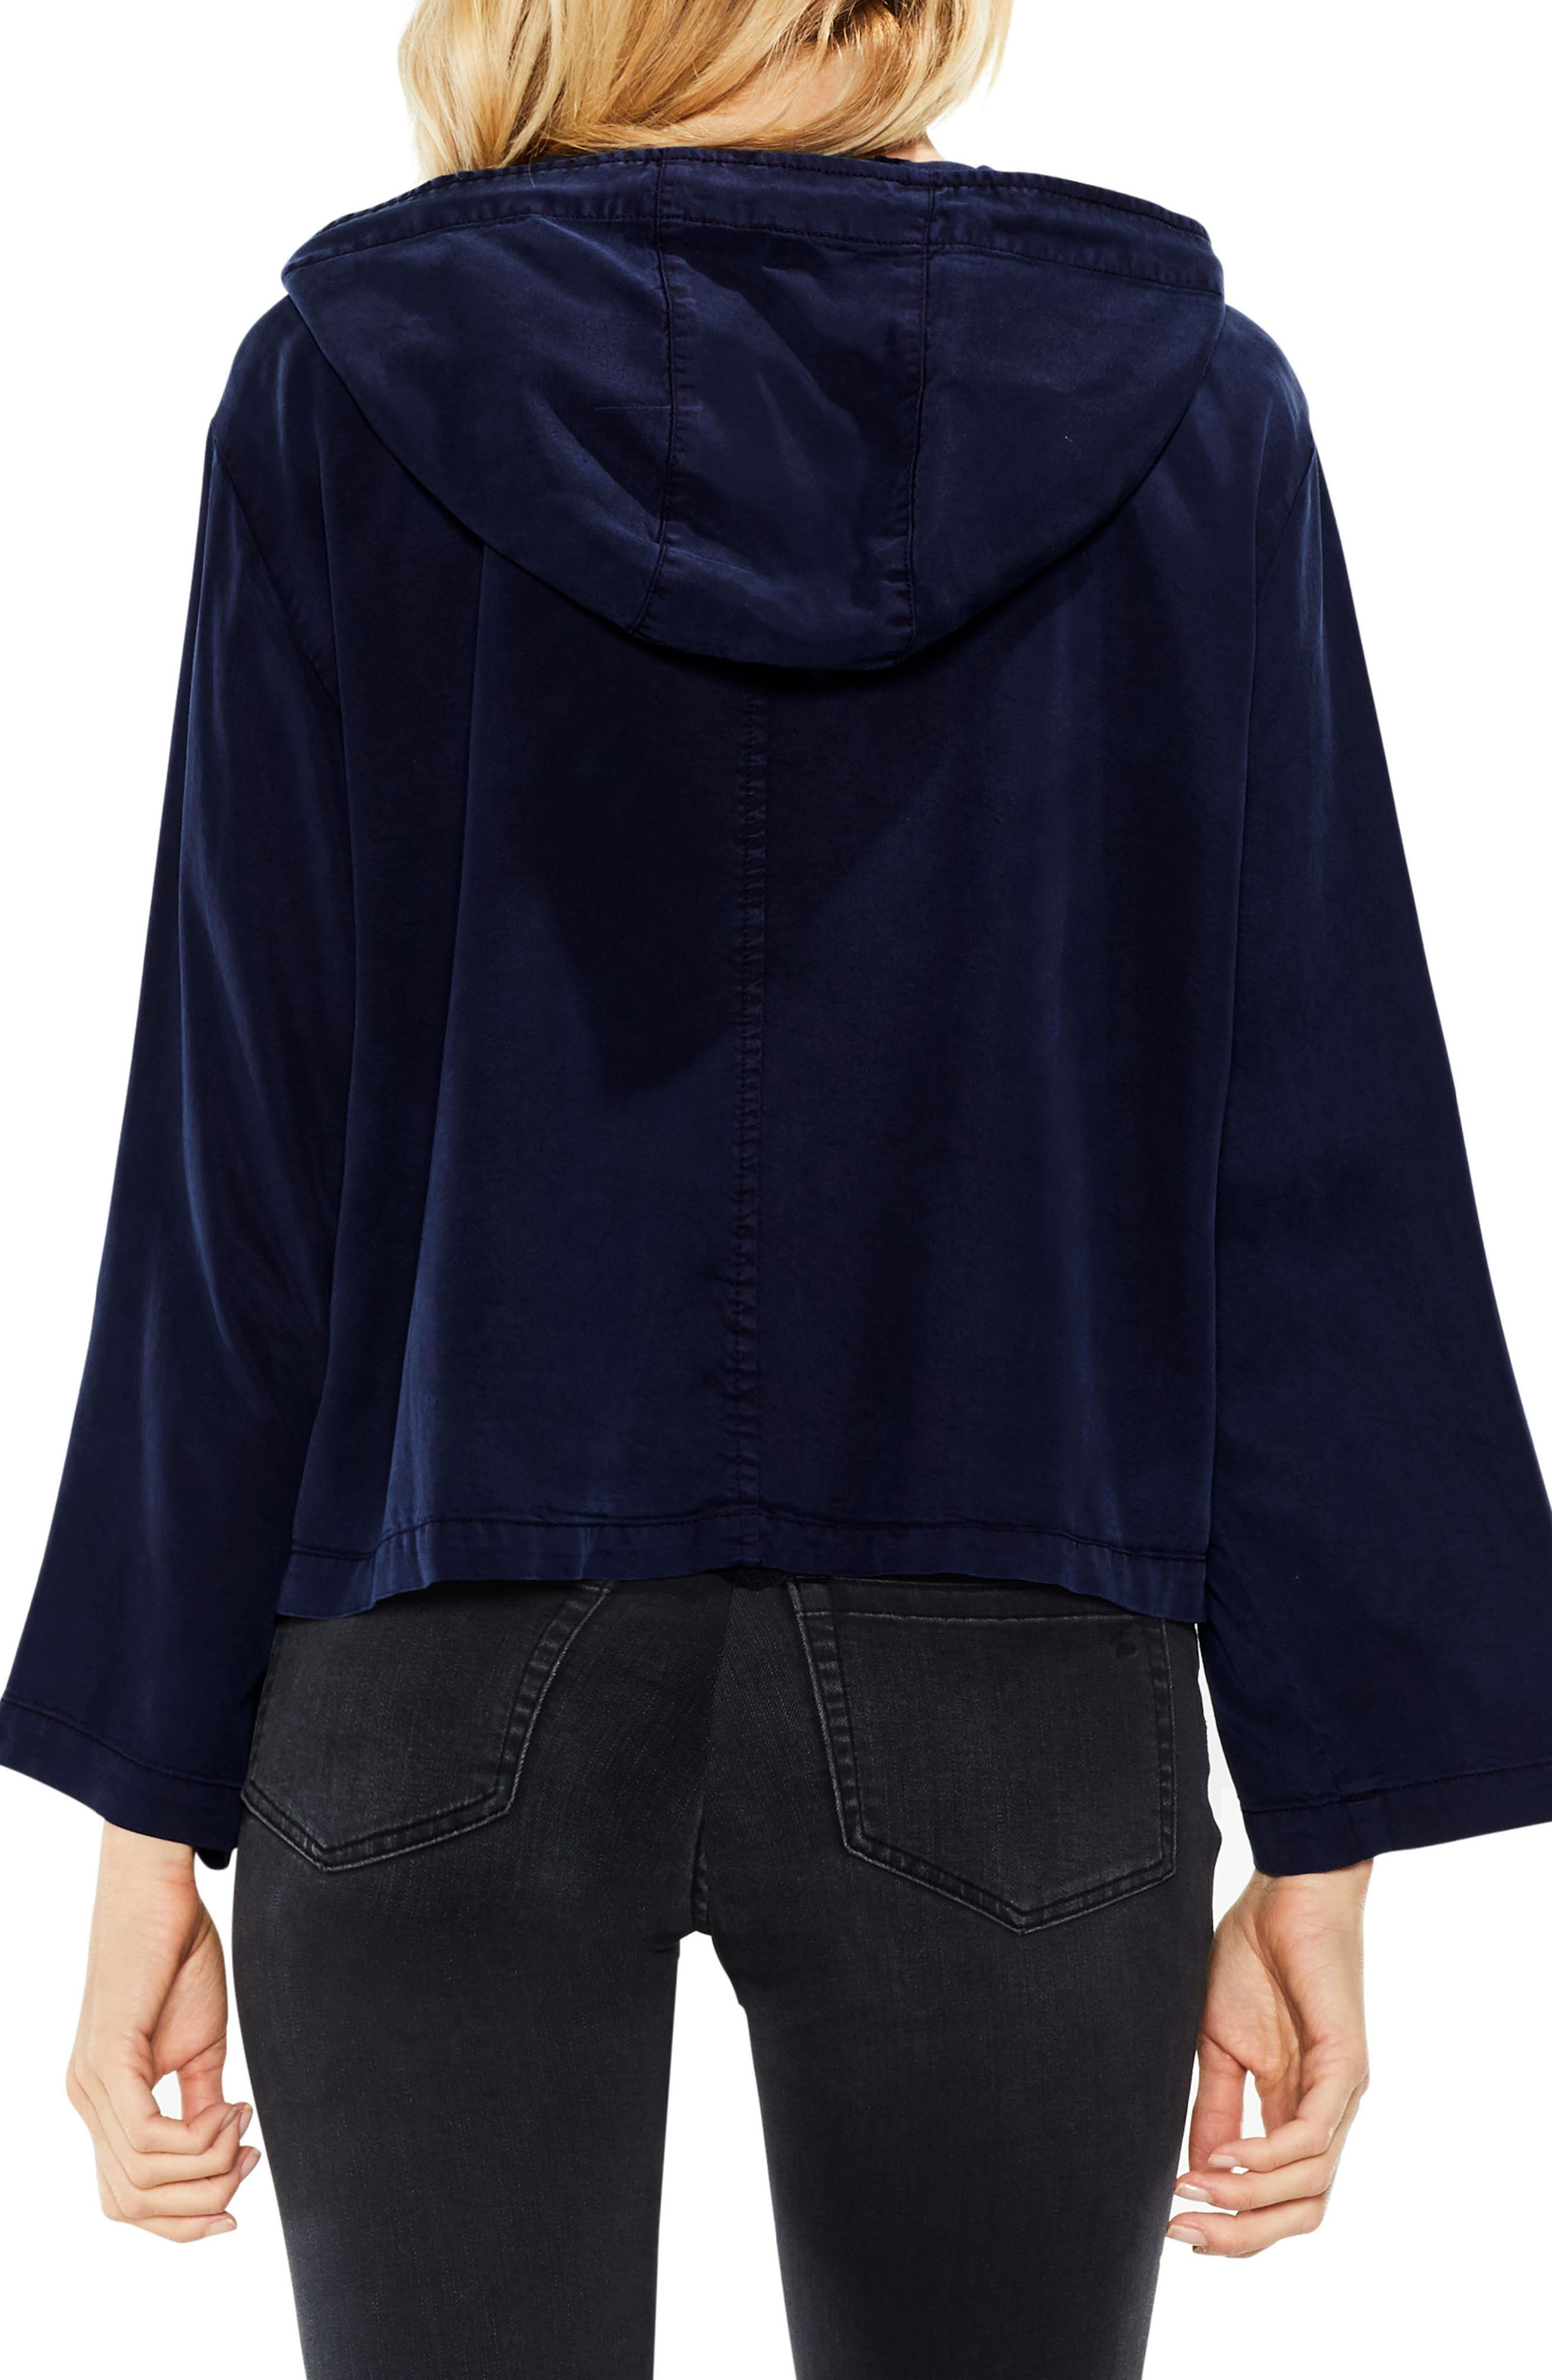 Bell Sleeve Hooded Jacket,                             Alternate thumbnail 3, color,                             461